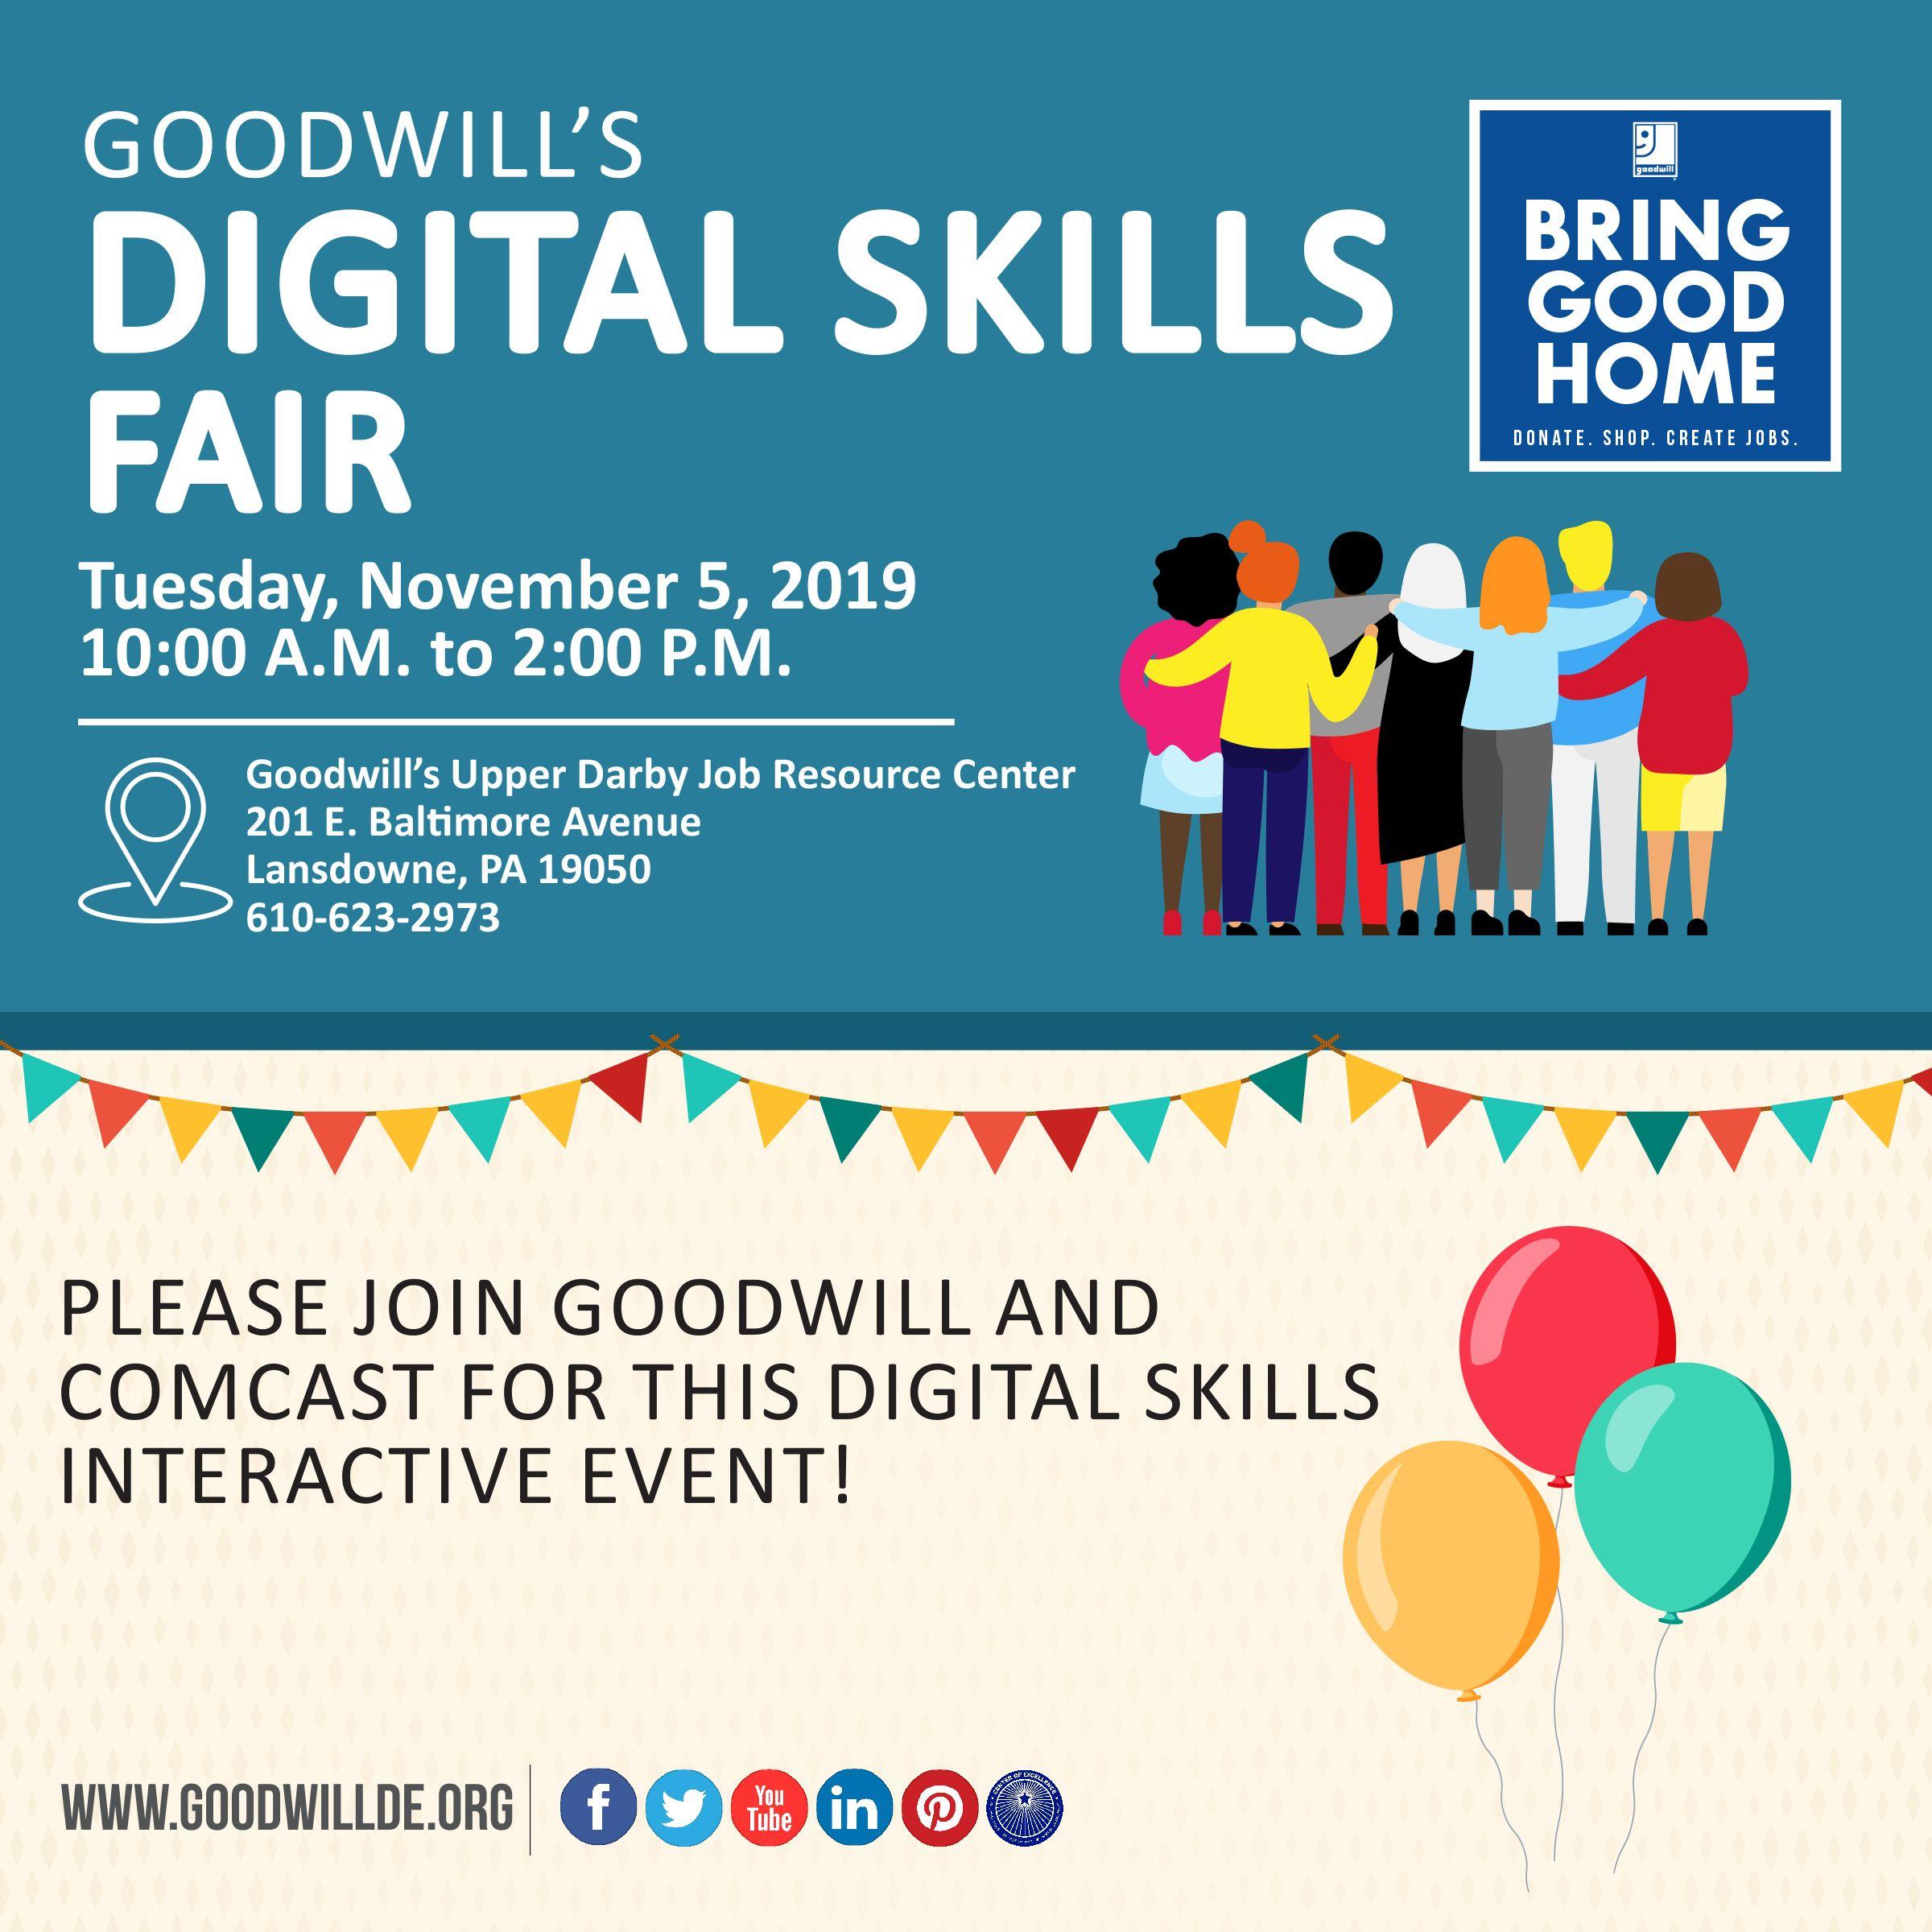 Goodwill S Digital Skills Fair Tuesday November 5 2019 10 00